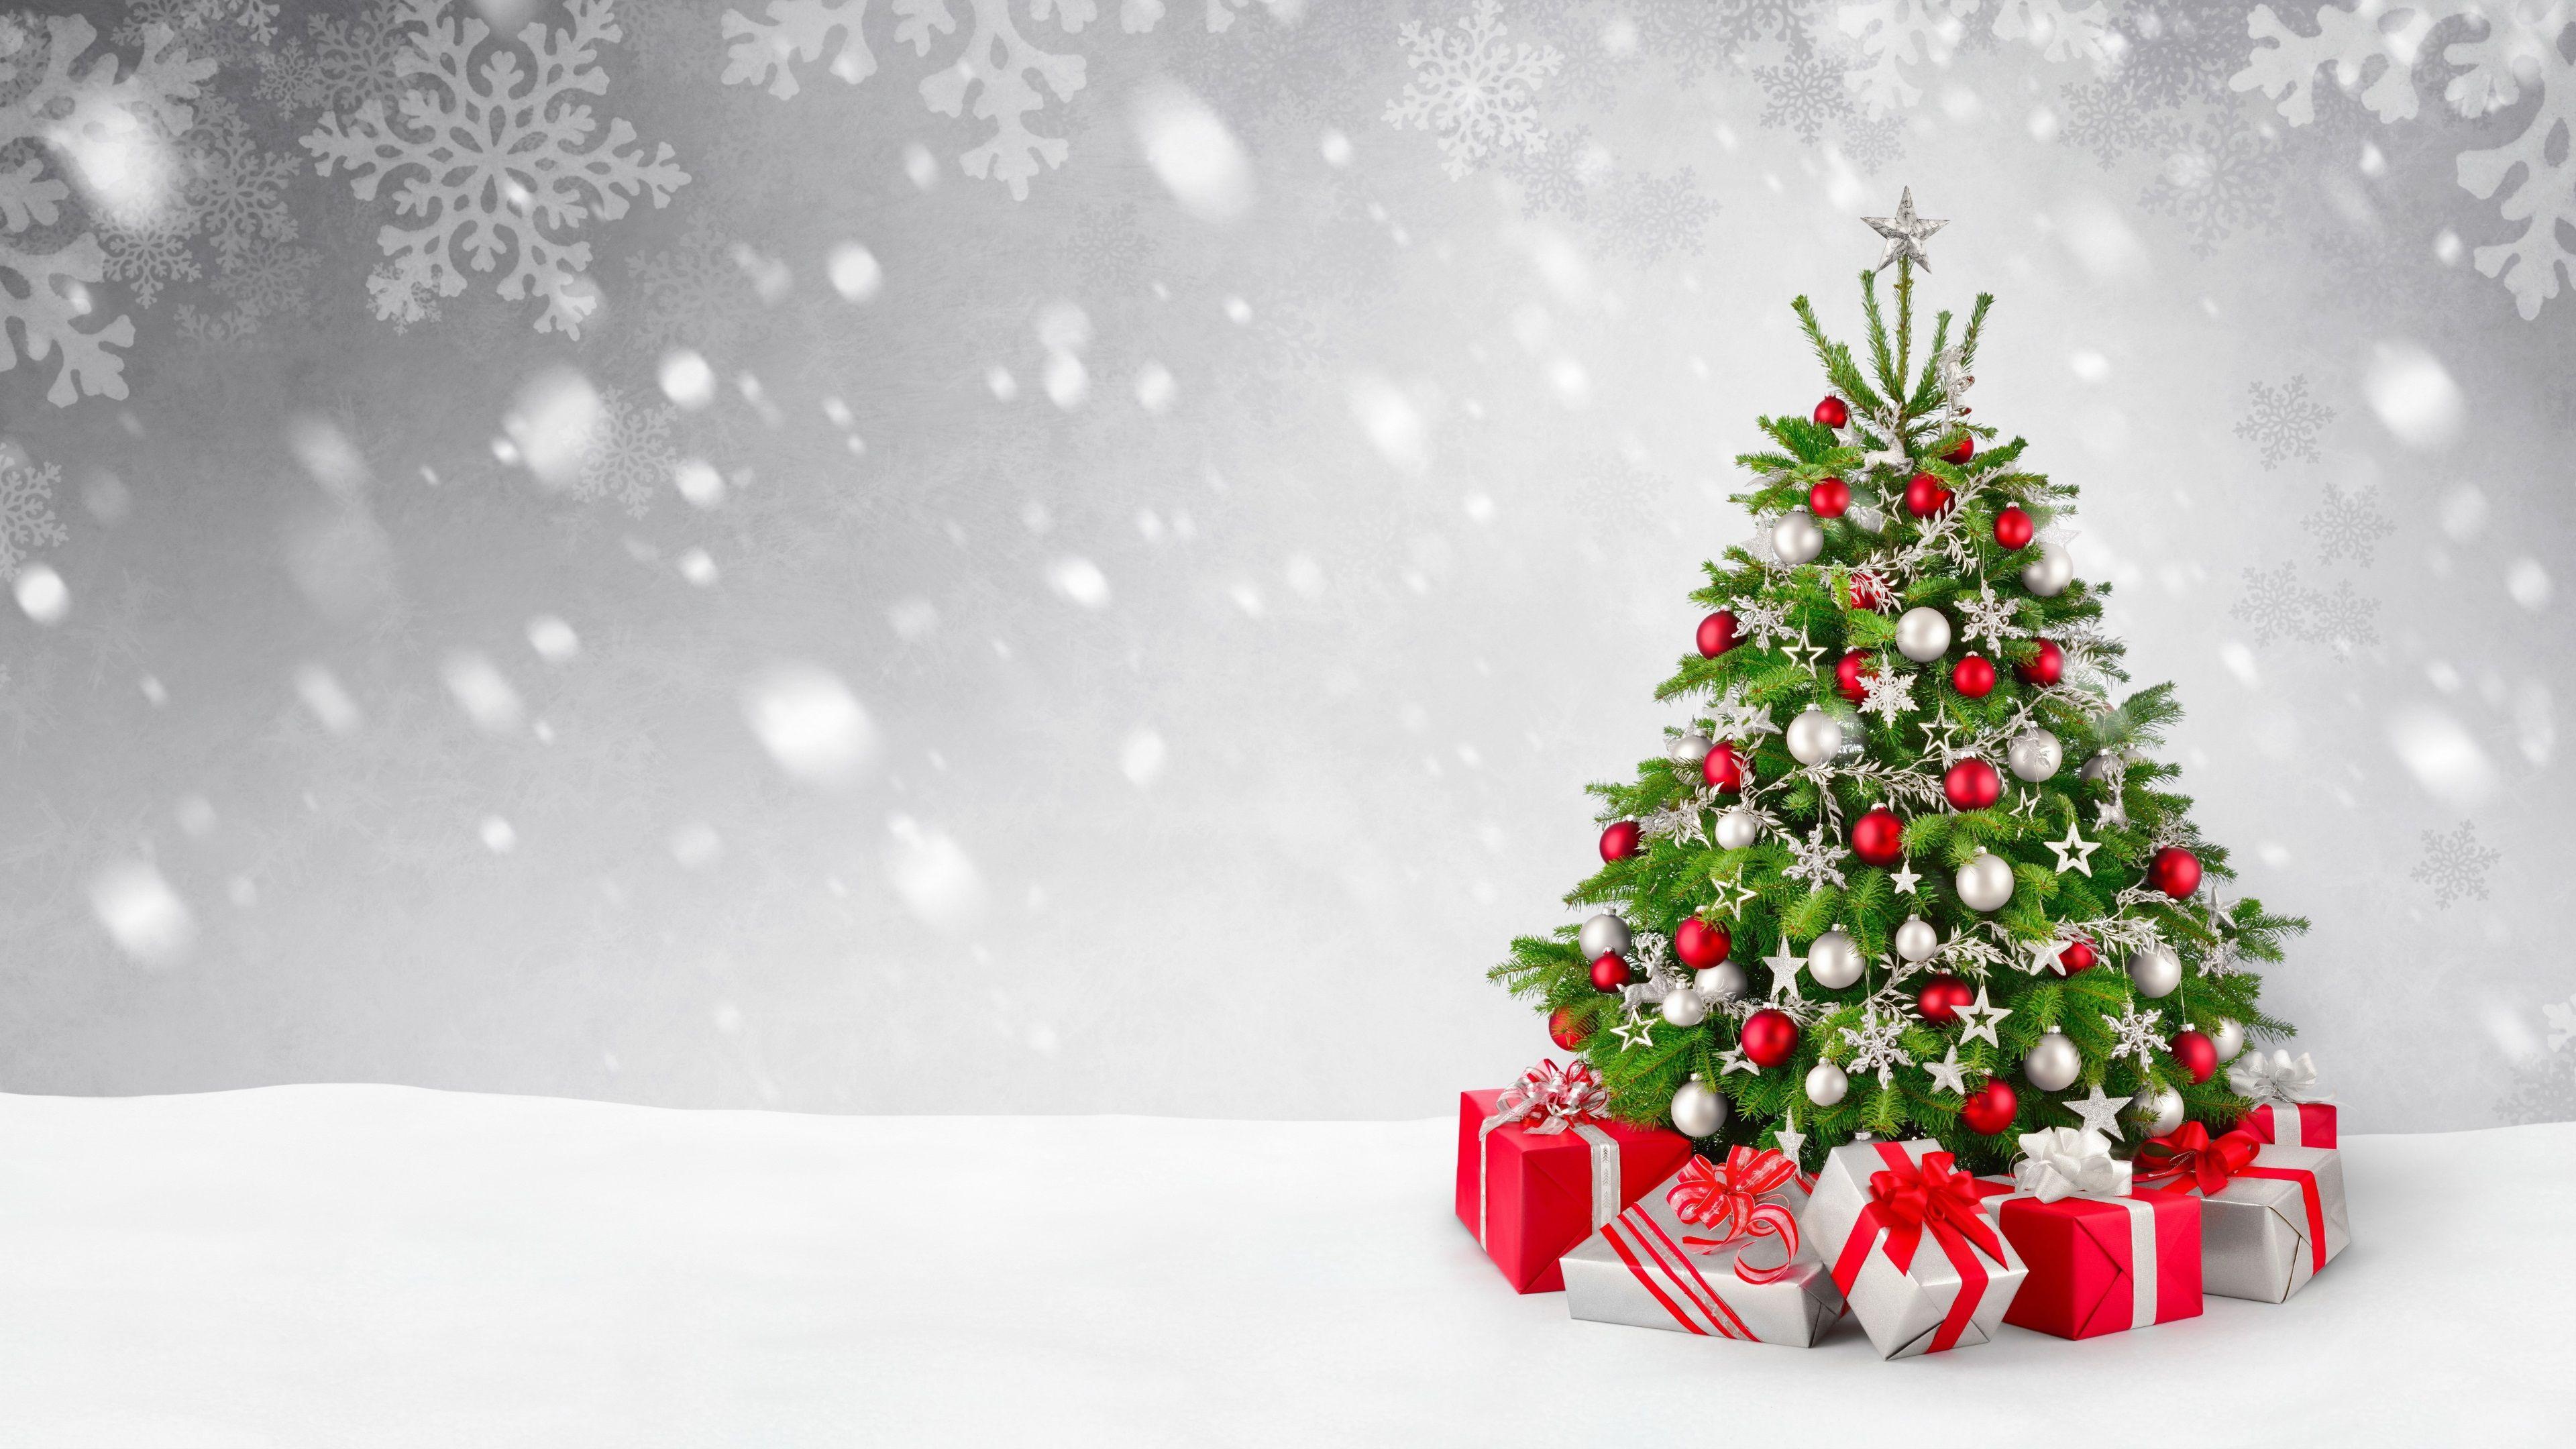 3840x2160 Christmas Tree 4k Desktop Background Christmas Tree Wallpaper Christmas Tree Decorations Wallpaper Christmas Tree Background